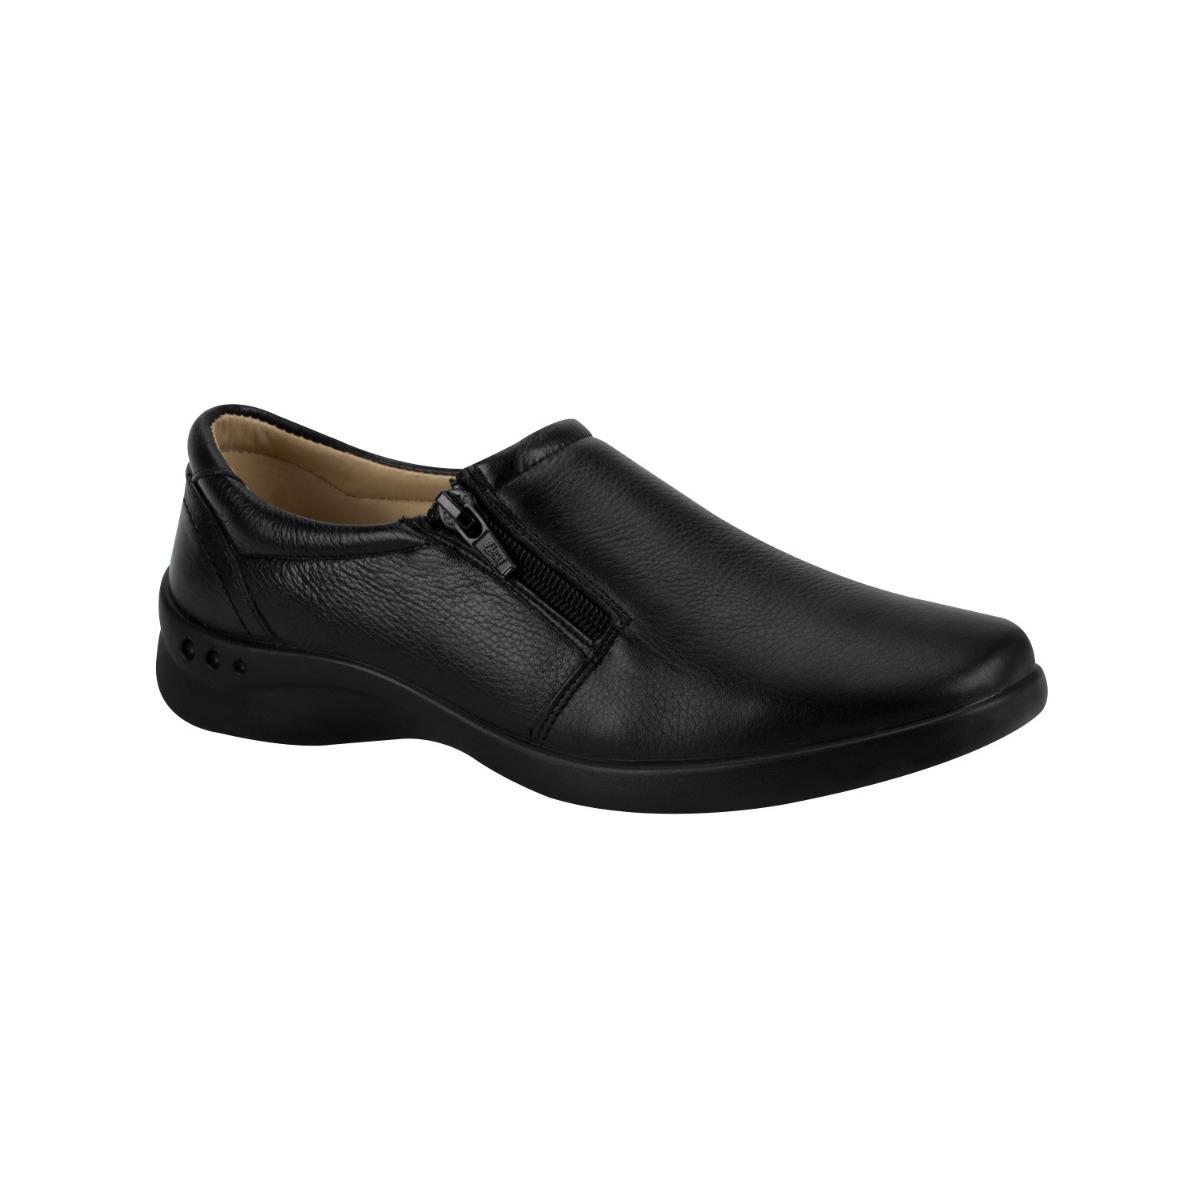 435047e1 zapatos comodos mujer confort piso flexi negro piel co177 a. Cargando zoom.